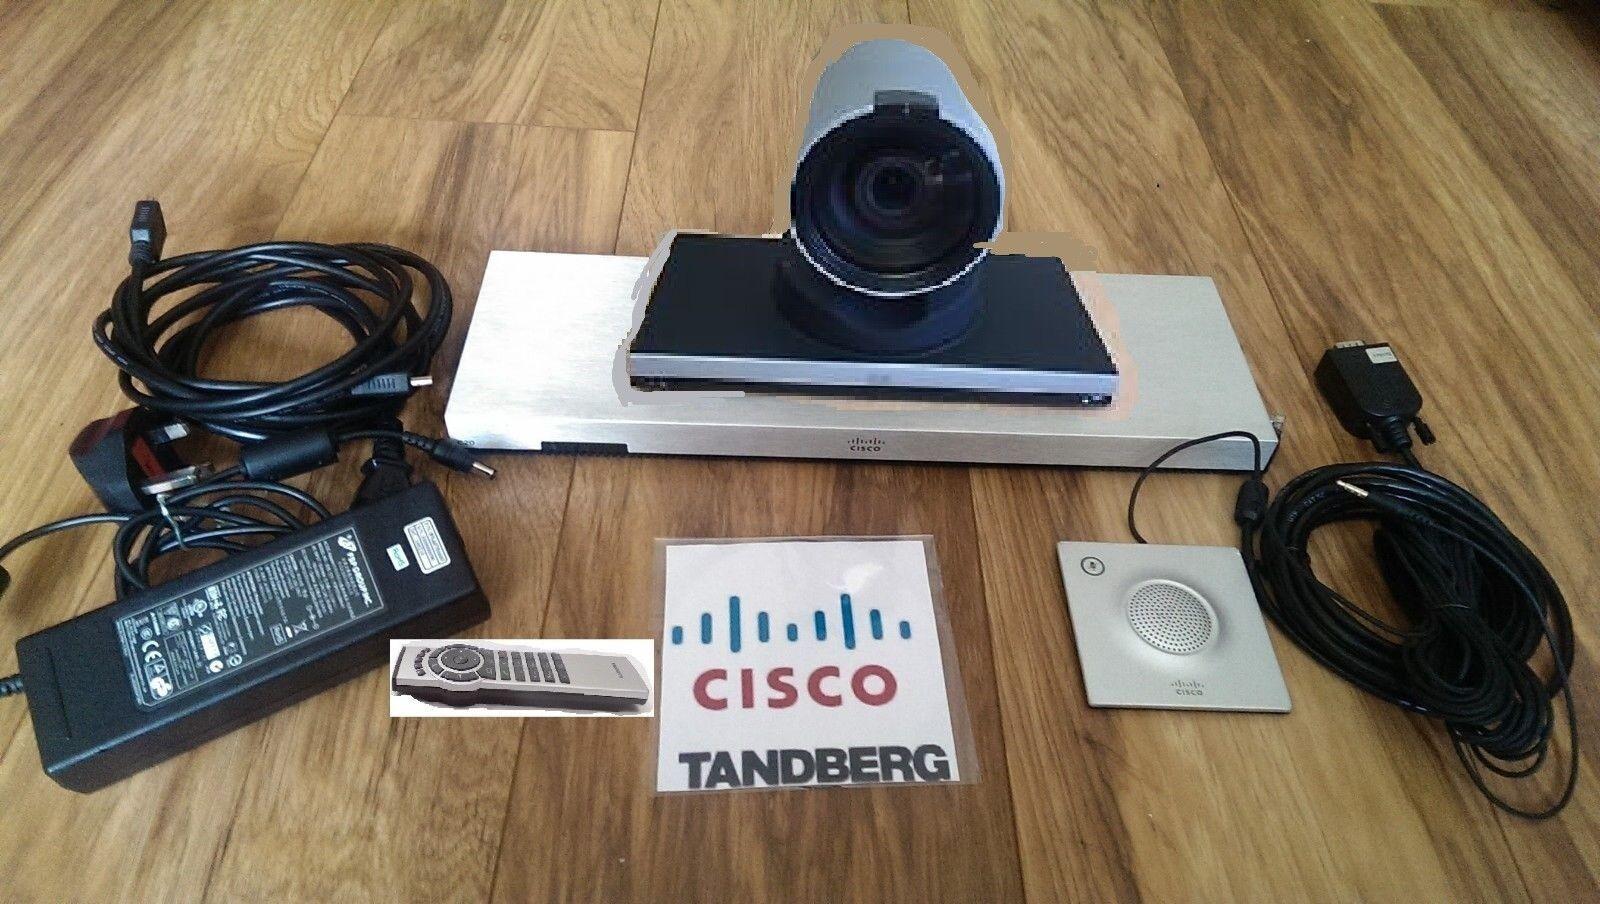 Cisco C20 Tandberg Telepresence TTC7-18 HD Video Conferencing complete System